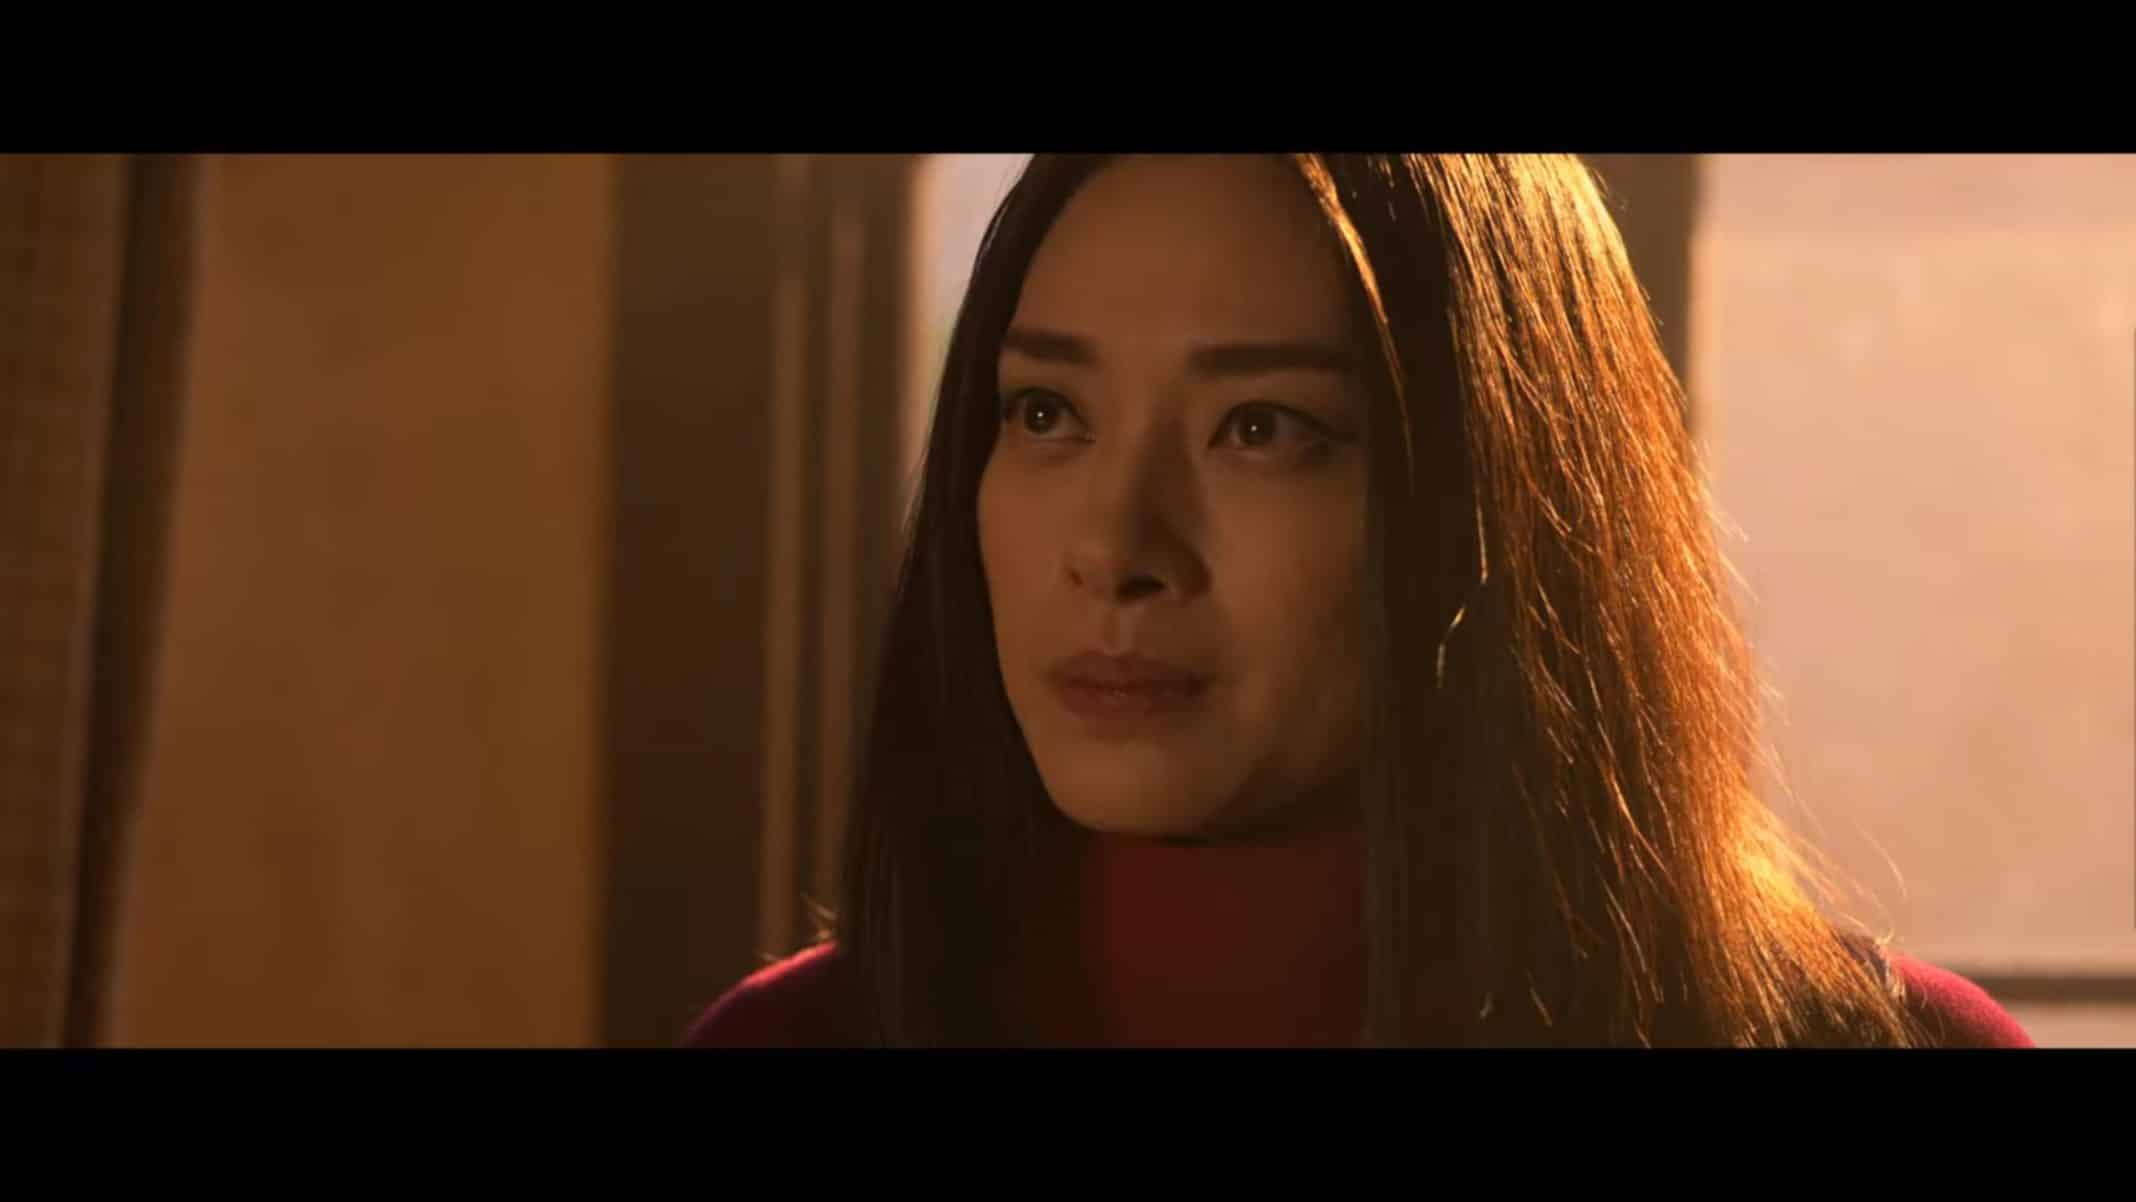 Quynh (Van Veronica Ngo) talking to Booker in his room.